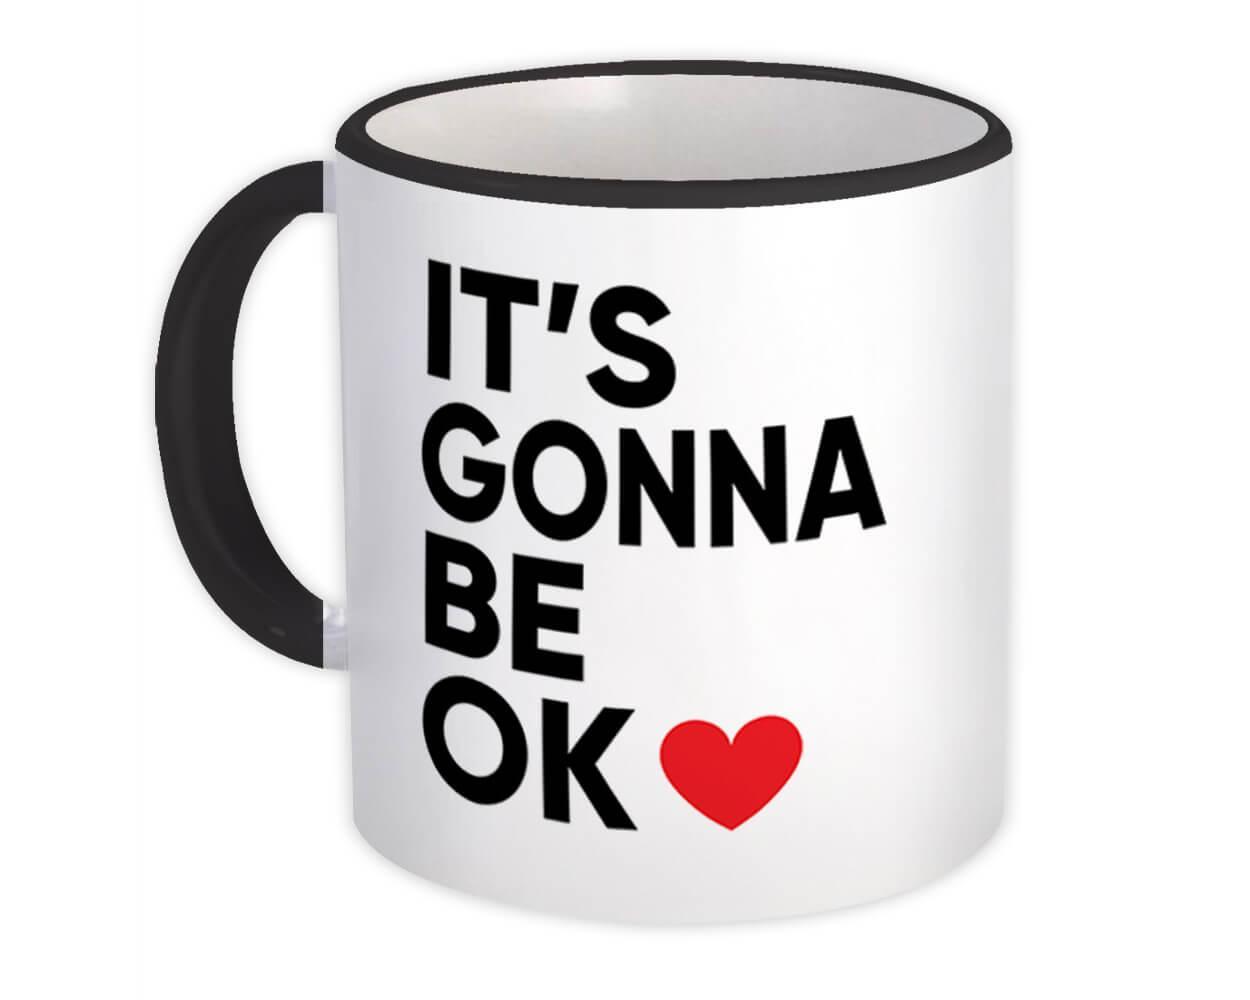 It's Gonna Be Ok : Gift Mug Get Well Quarantine Social Distancing